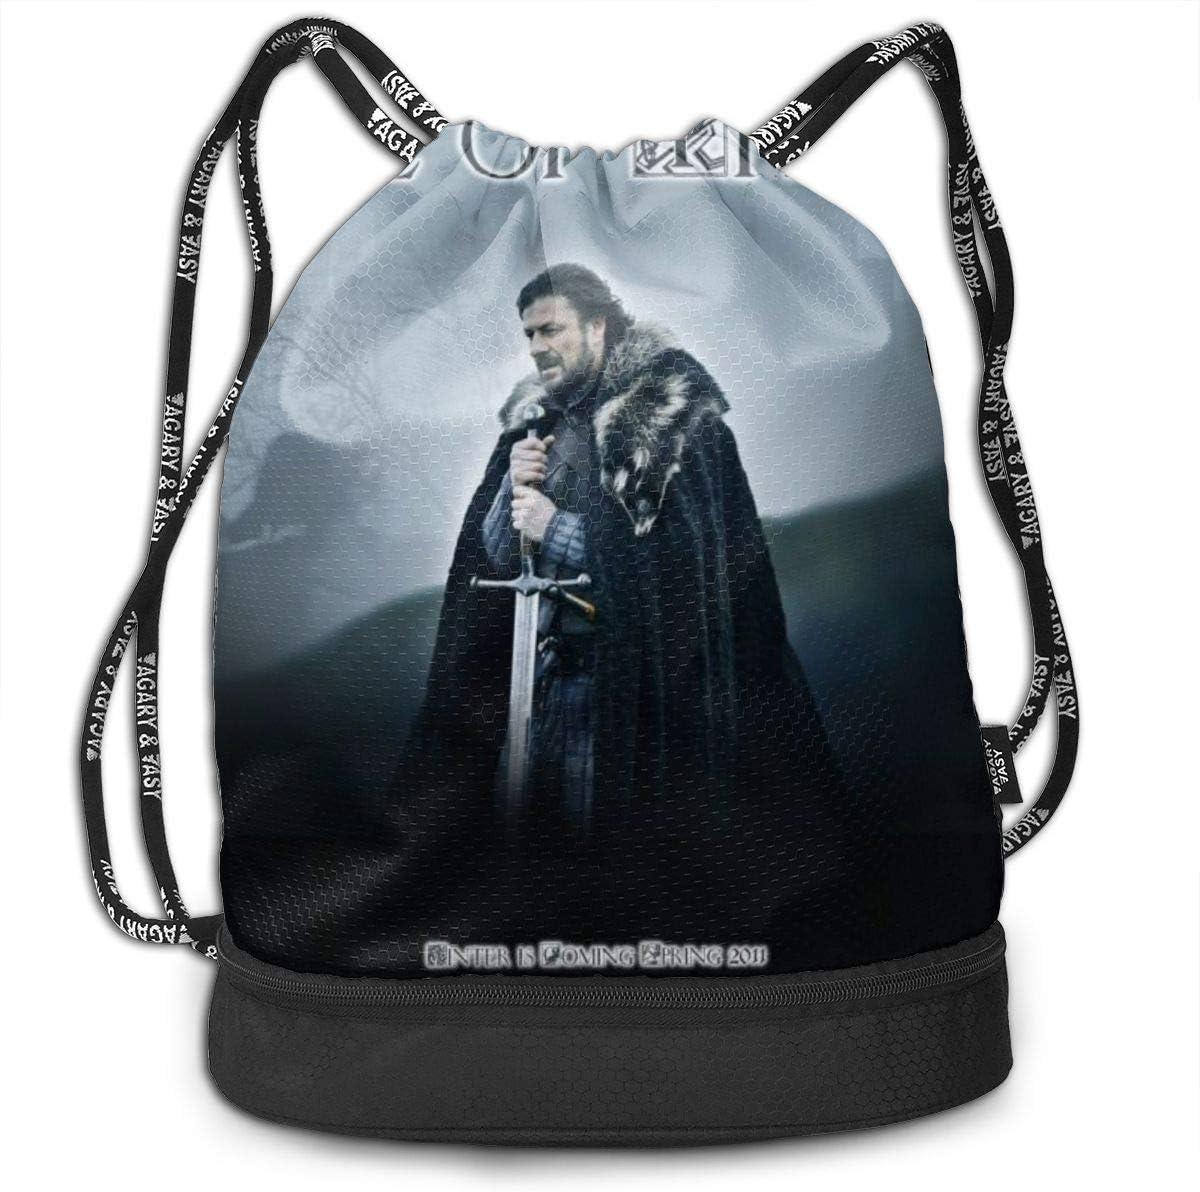 Game Of Thron-es Drawstring Backpack Athletic Gym Bag Sport Sackpack,Hiking Travel Bag